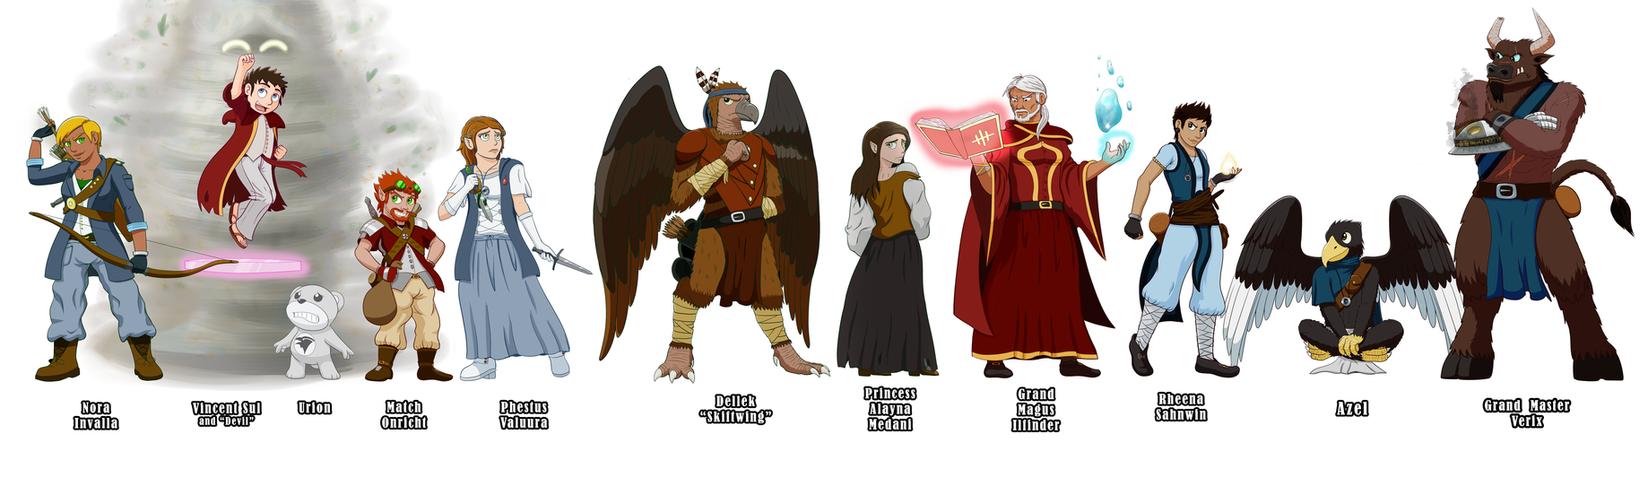 Character And Npc Design : Character design challenge dnd npcs complete by rasarak